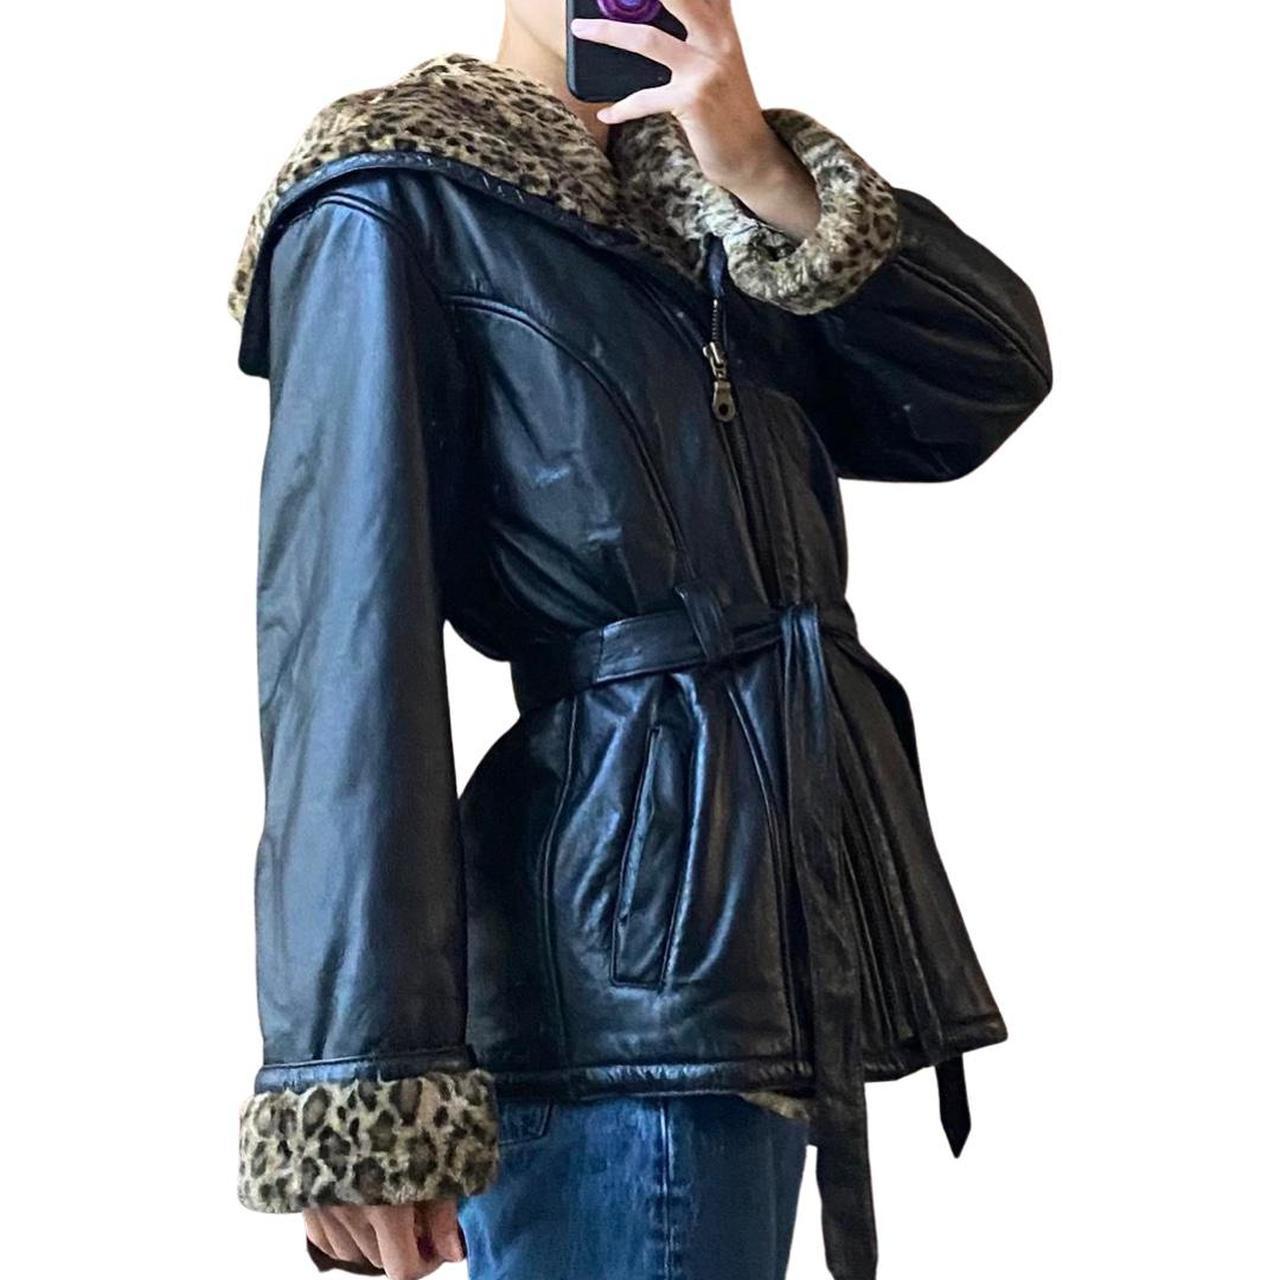 Product Image 1 - INSANE vintage leather belted jacket